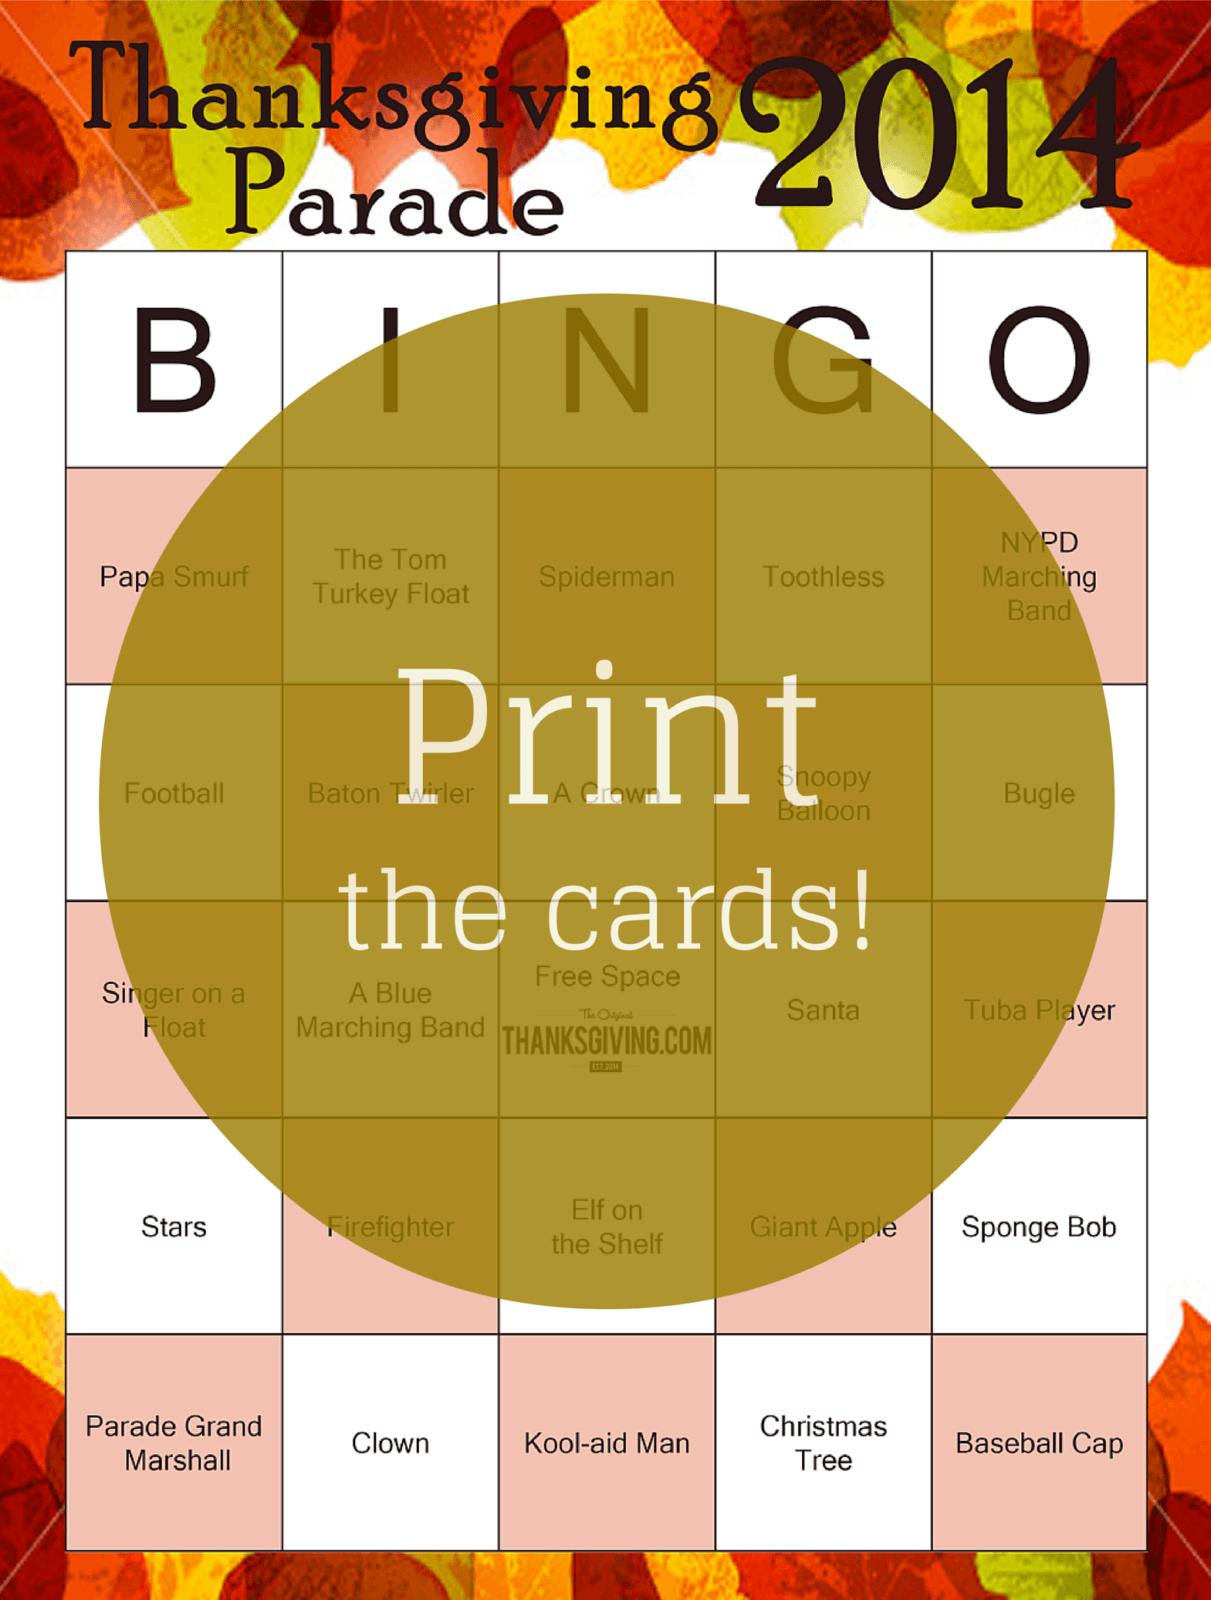 Printable Thanksgiving Bingo cards from Thanksgiving.com